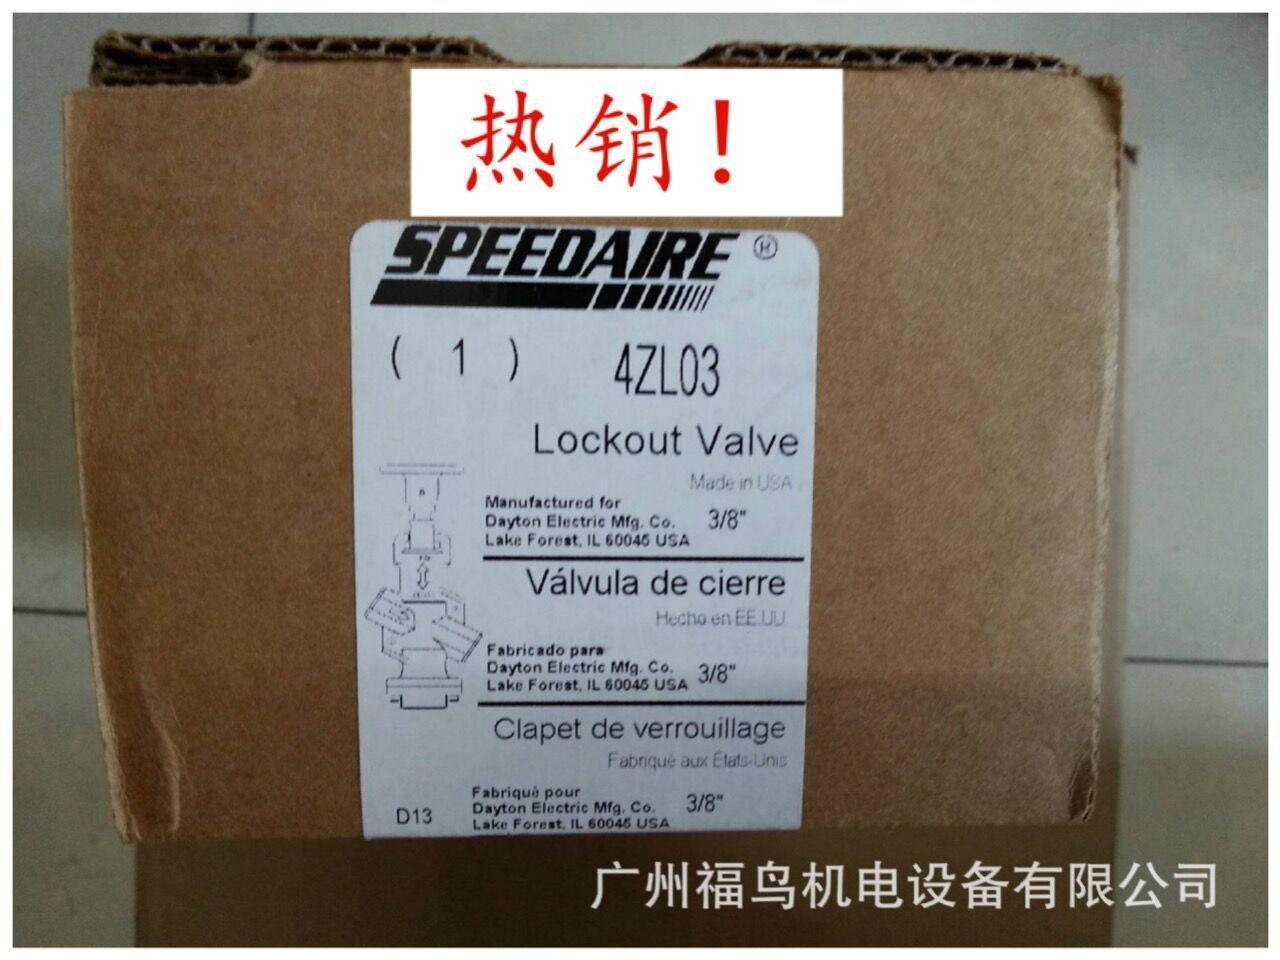 SPEEDAIRE锁阀  型号: 4ZL03